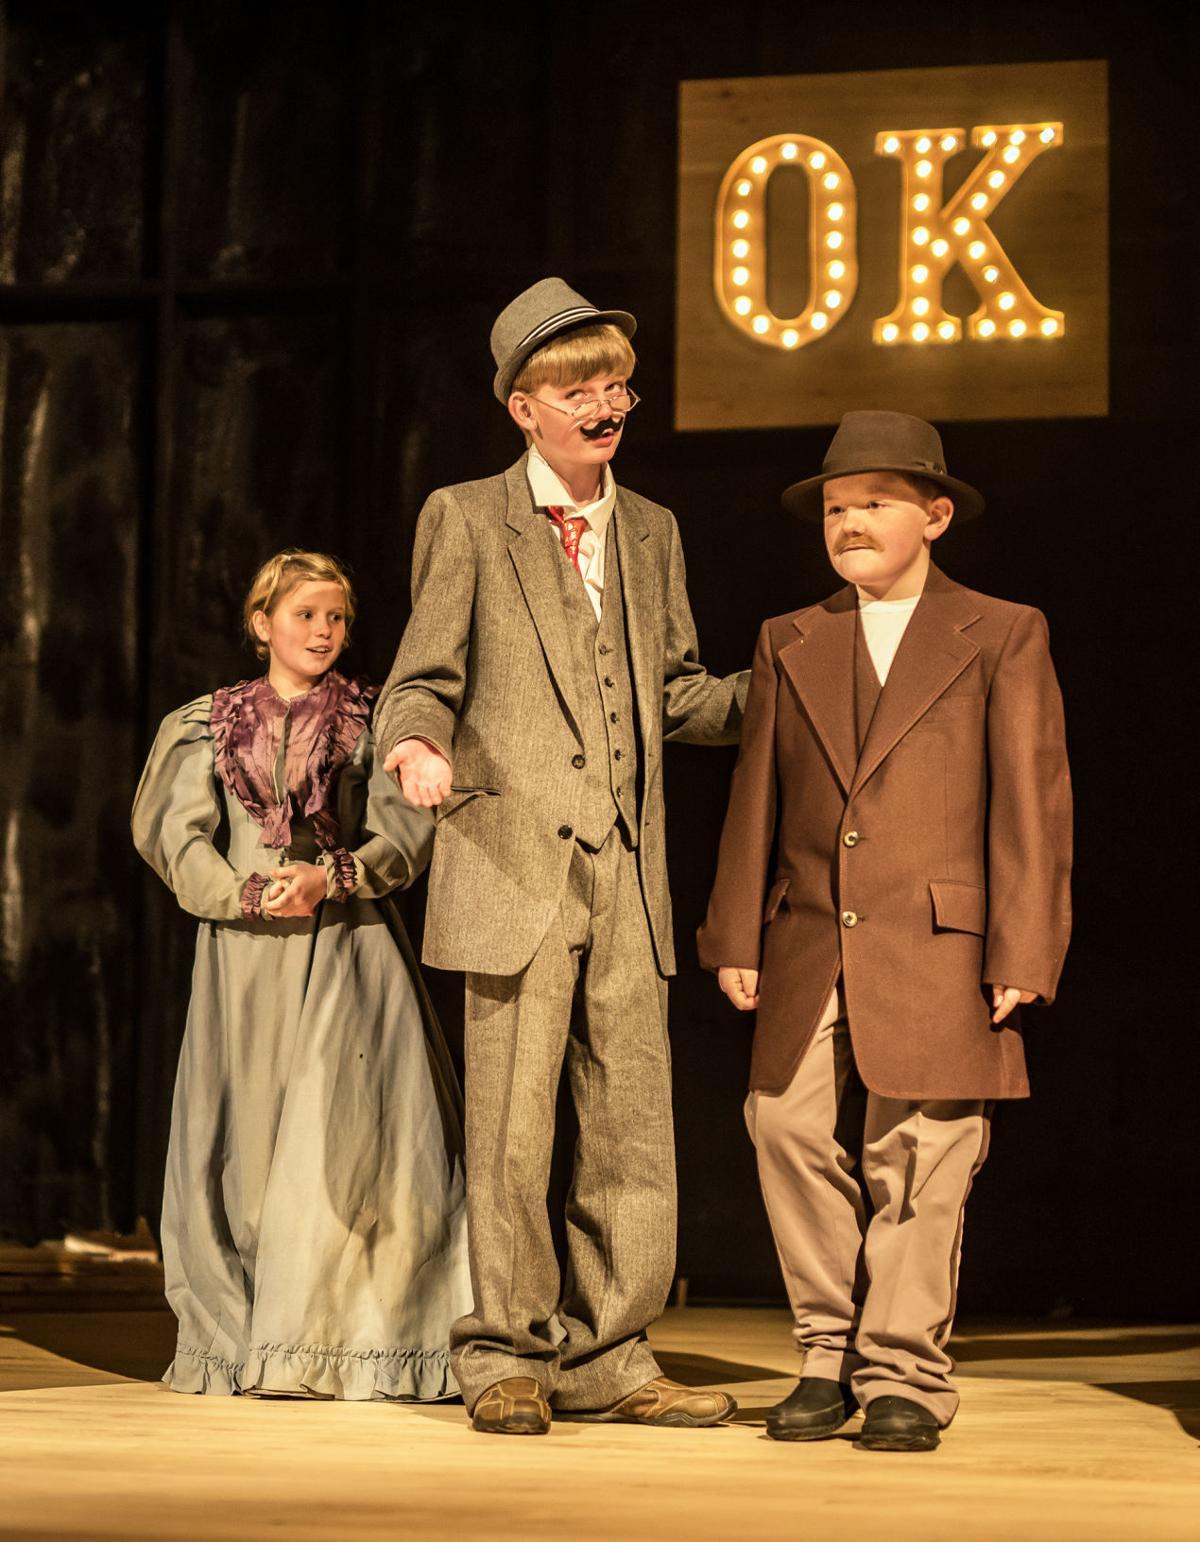 Fischer's students honor OK Theater's centennial anniversary #3